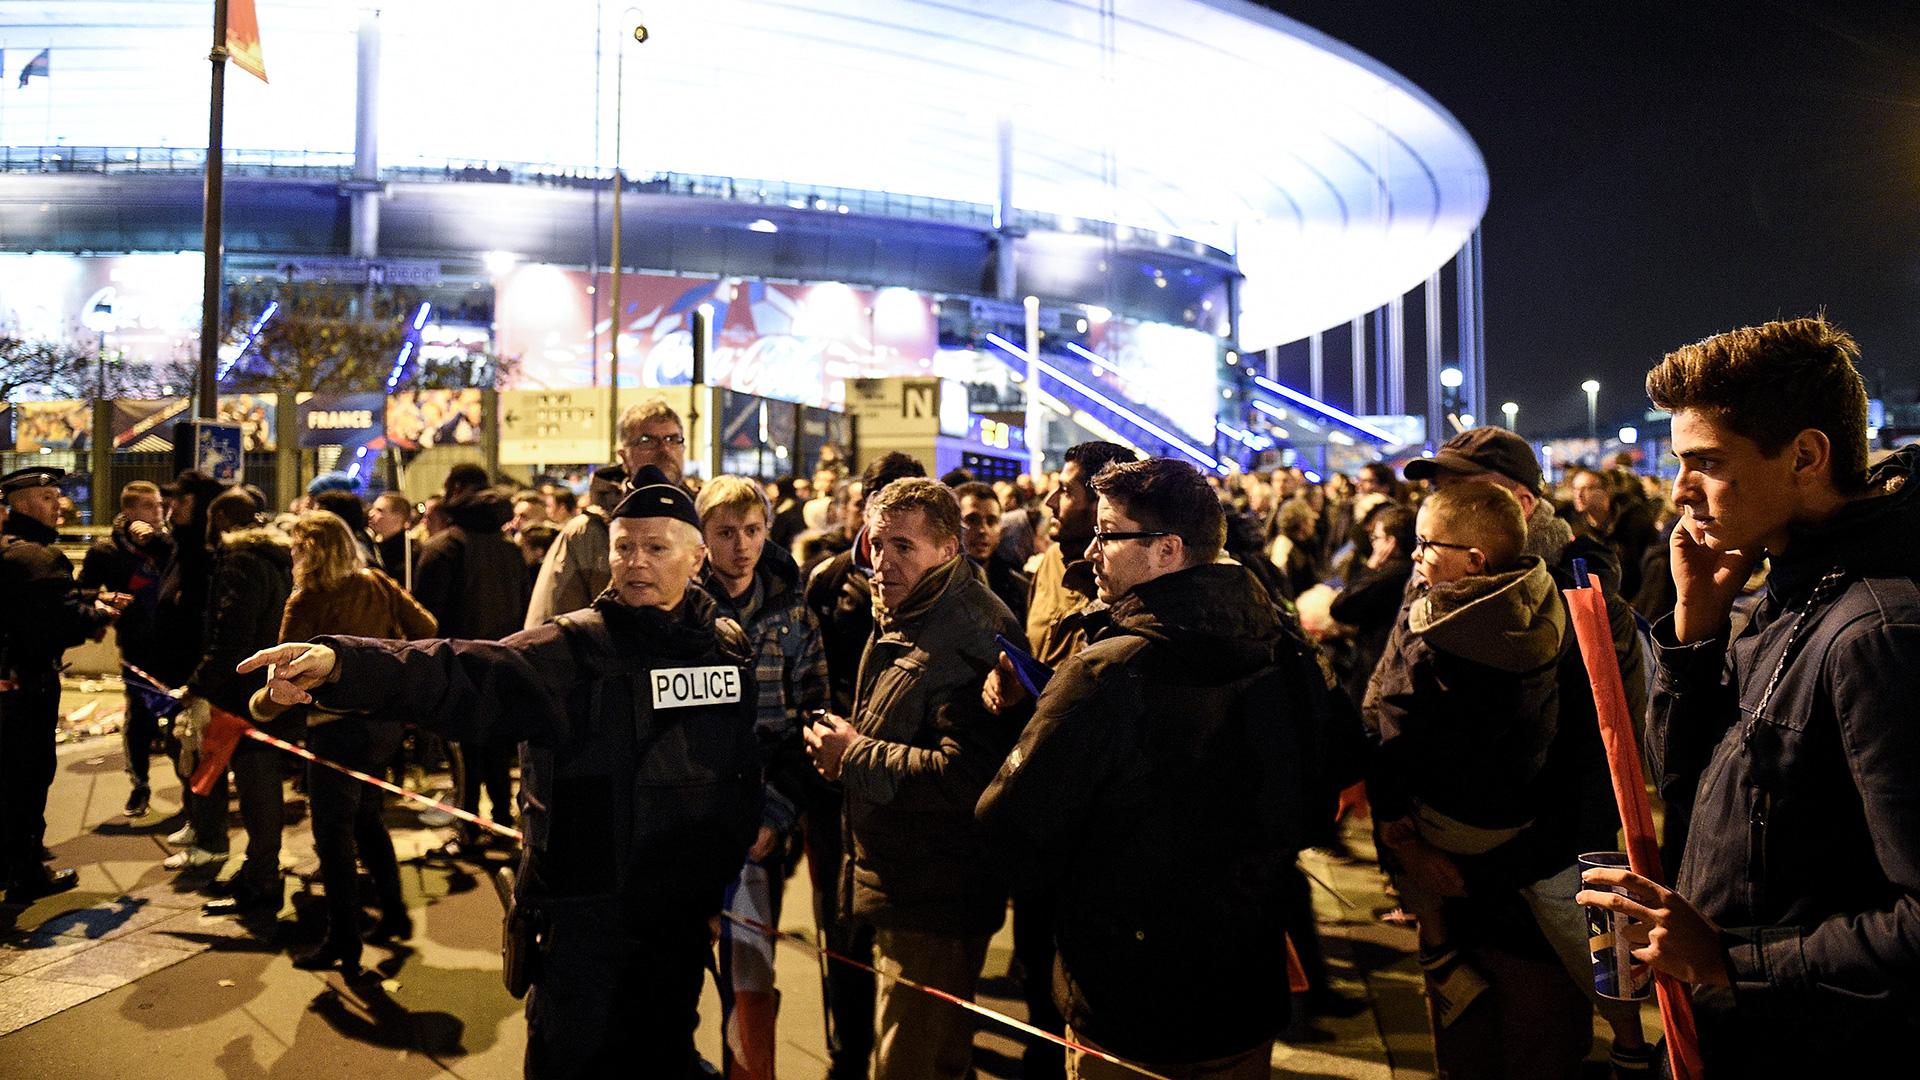 France-shootings-111315-GETTY-FTR.jpg